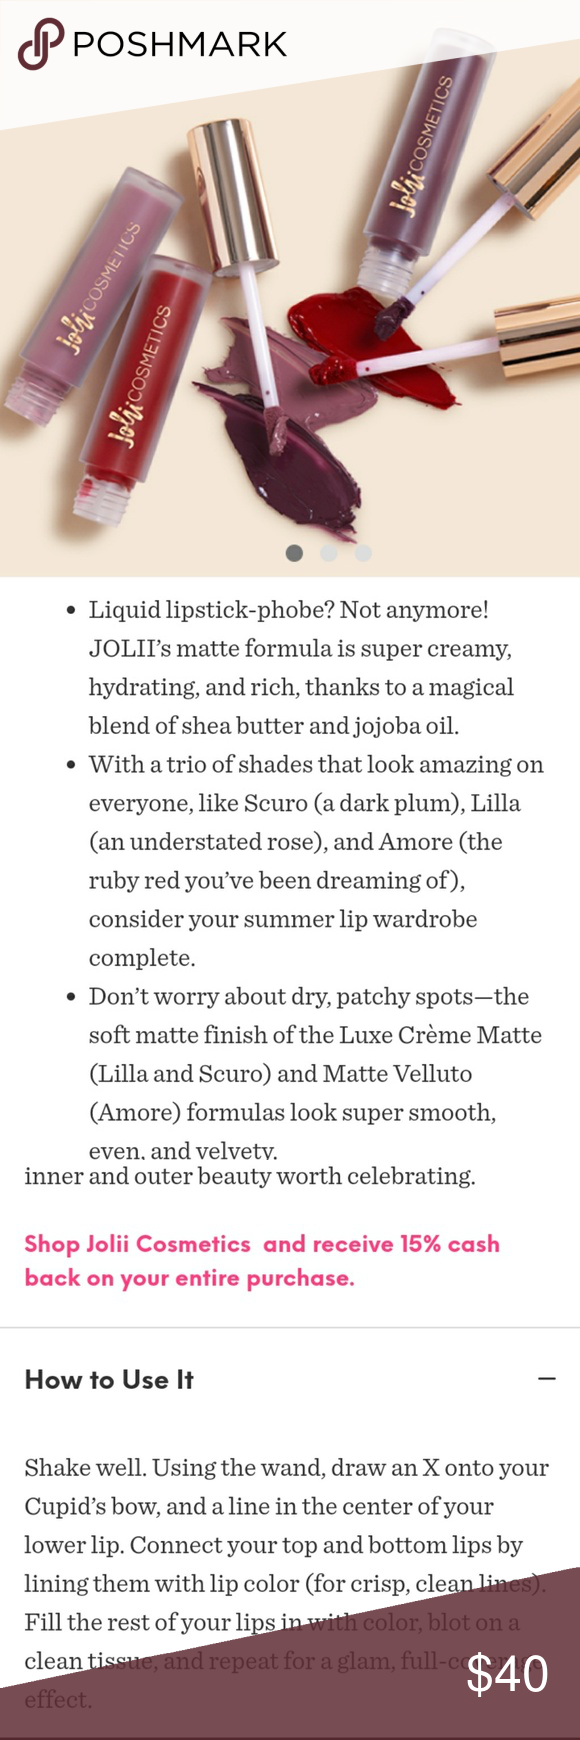 JOLII Luxe Cream matye Trio NIB 3 pc set 2.5 ml x 3 Colors:Scuro,Lilla,Amore Bundle 5 + items for 30% off the total💗 Sephora Makeup Lipstick